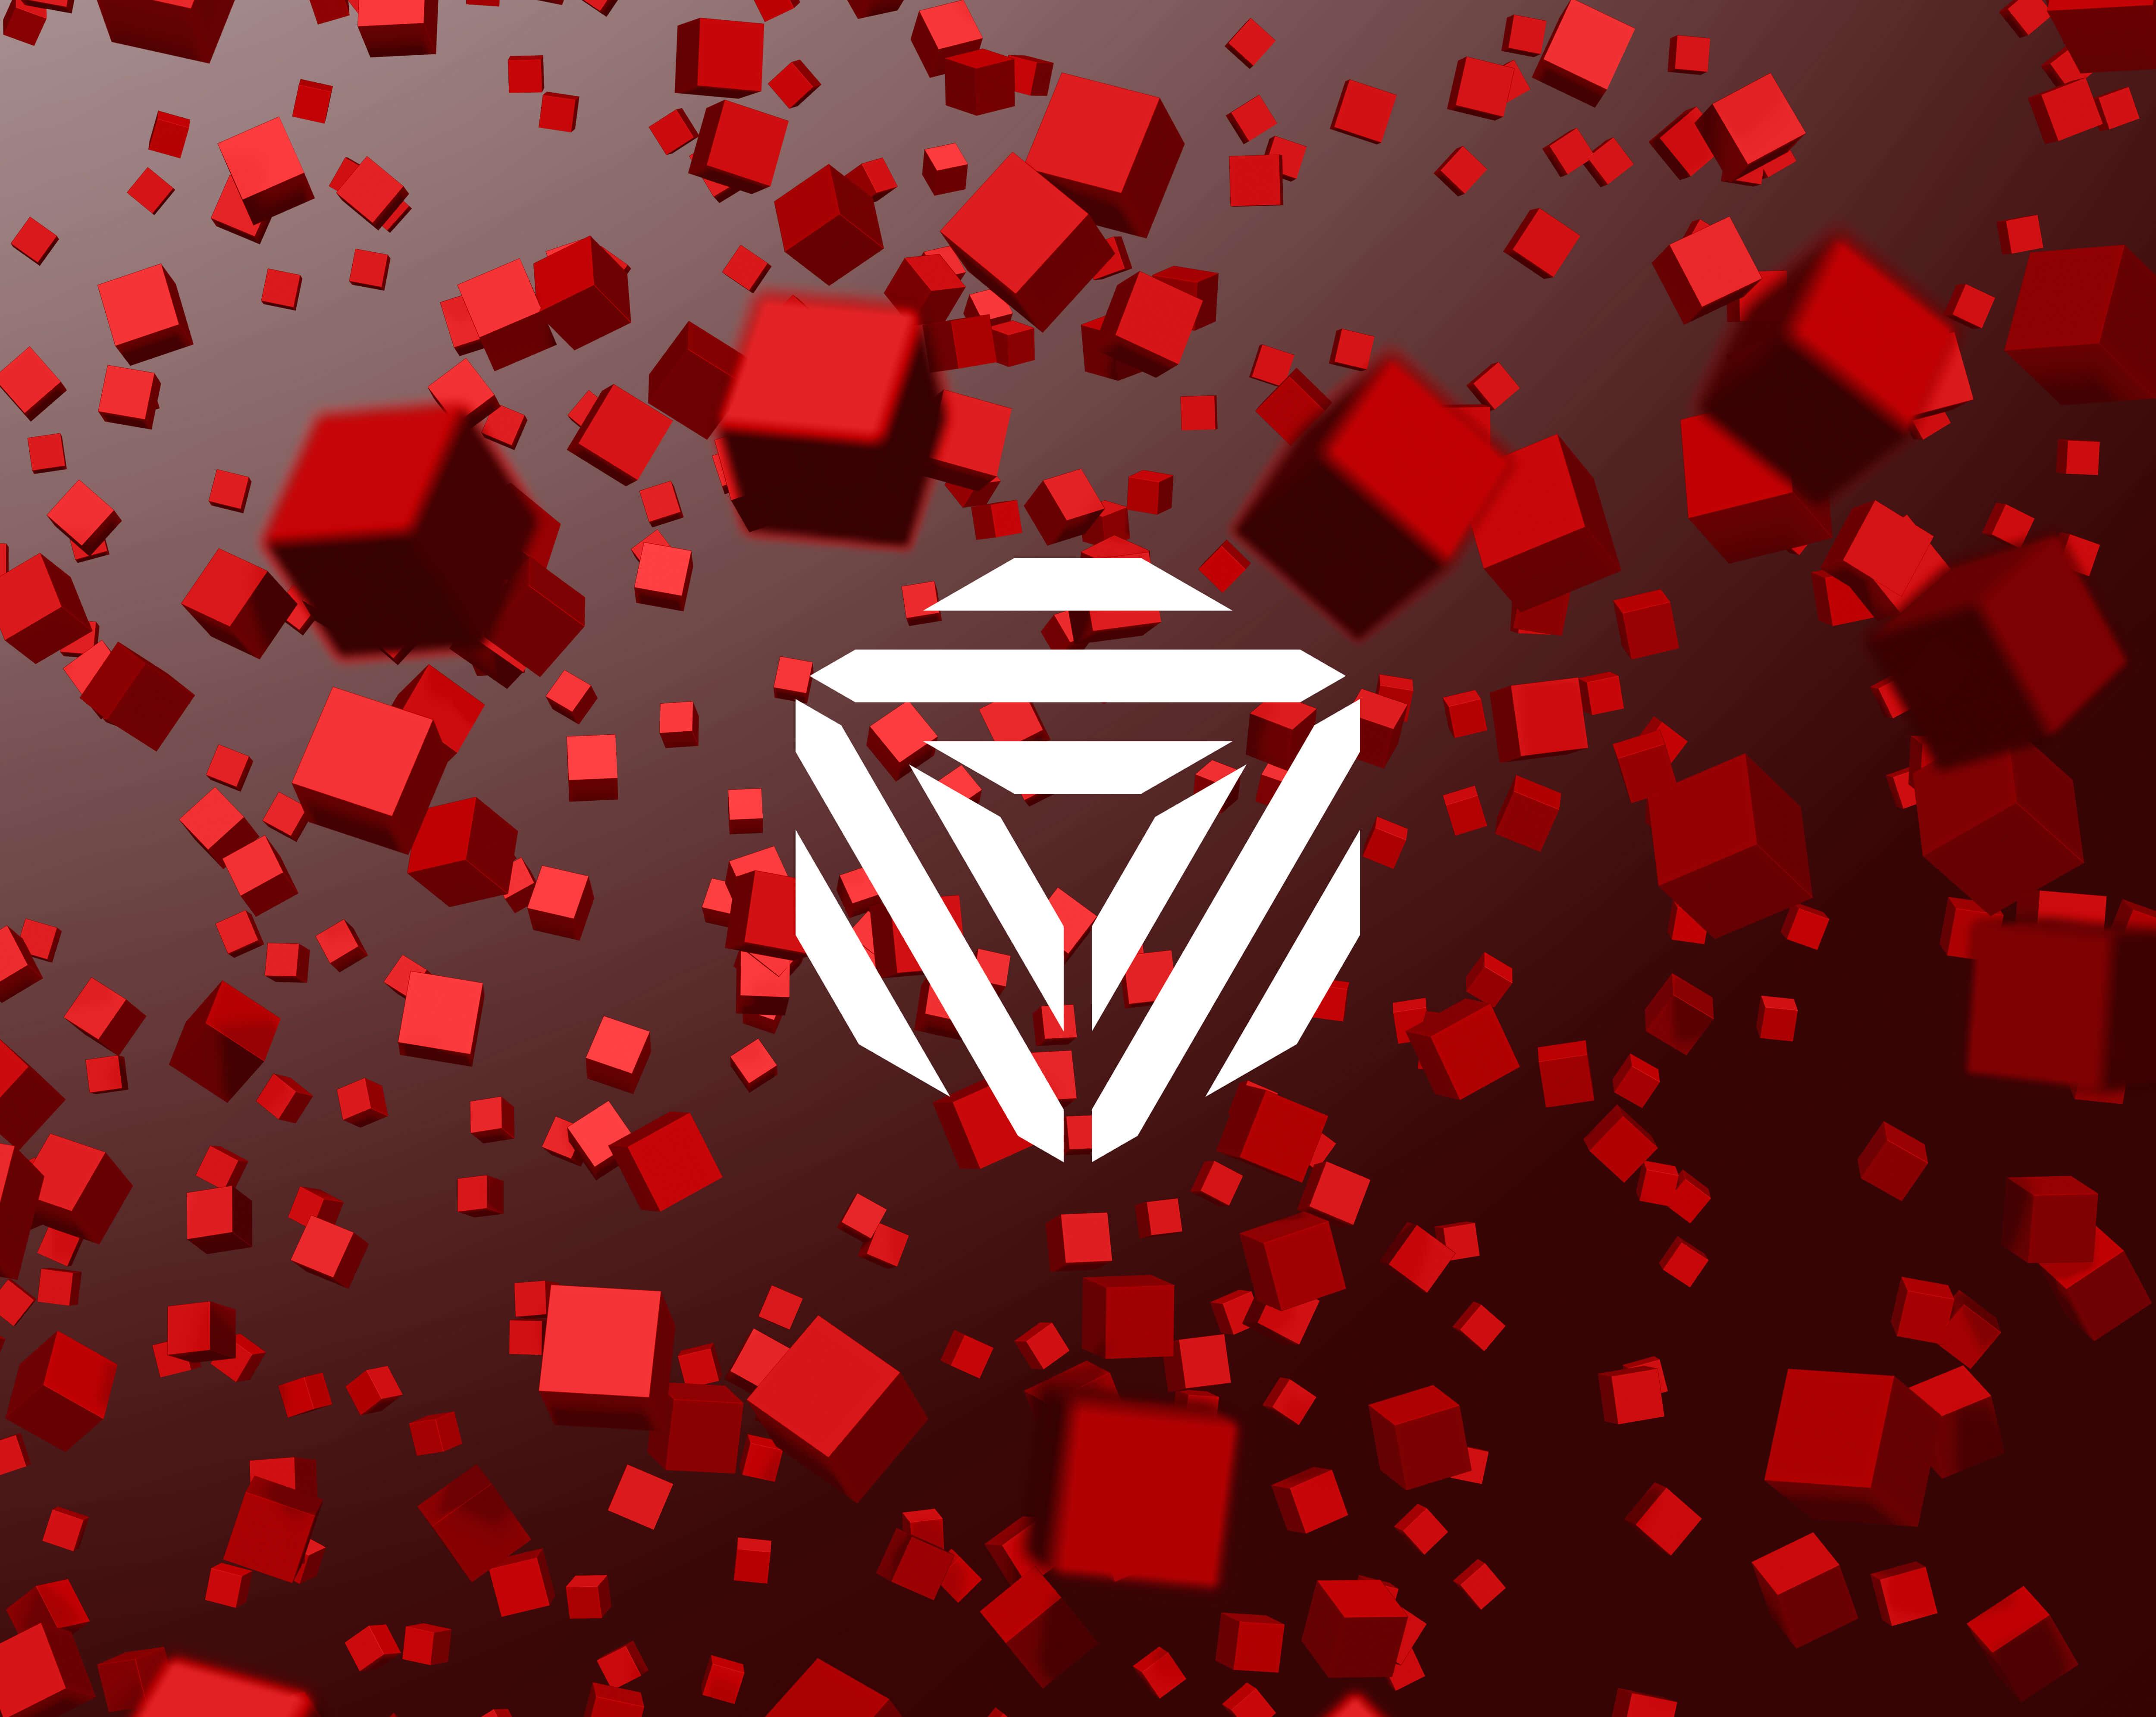 Main artwork for colourcube identity project